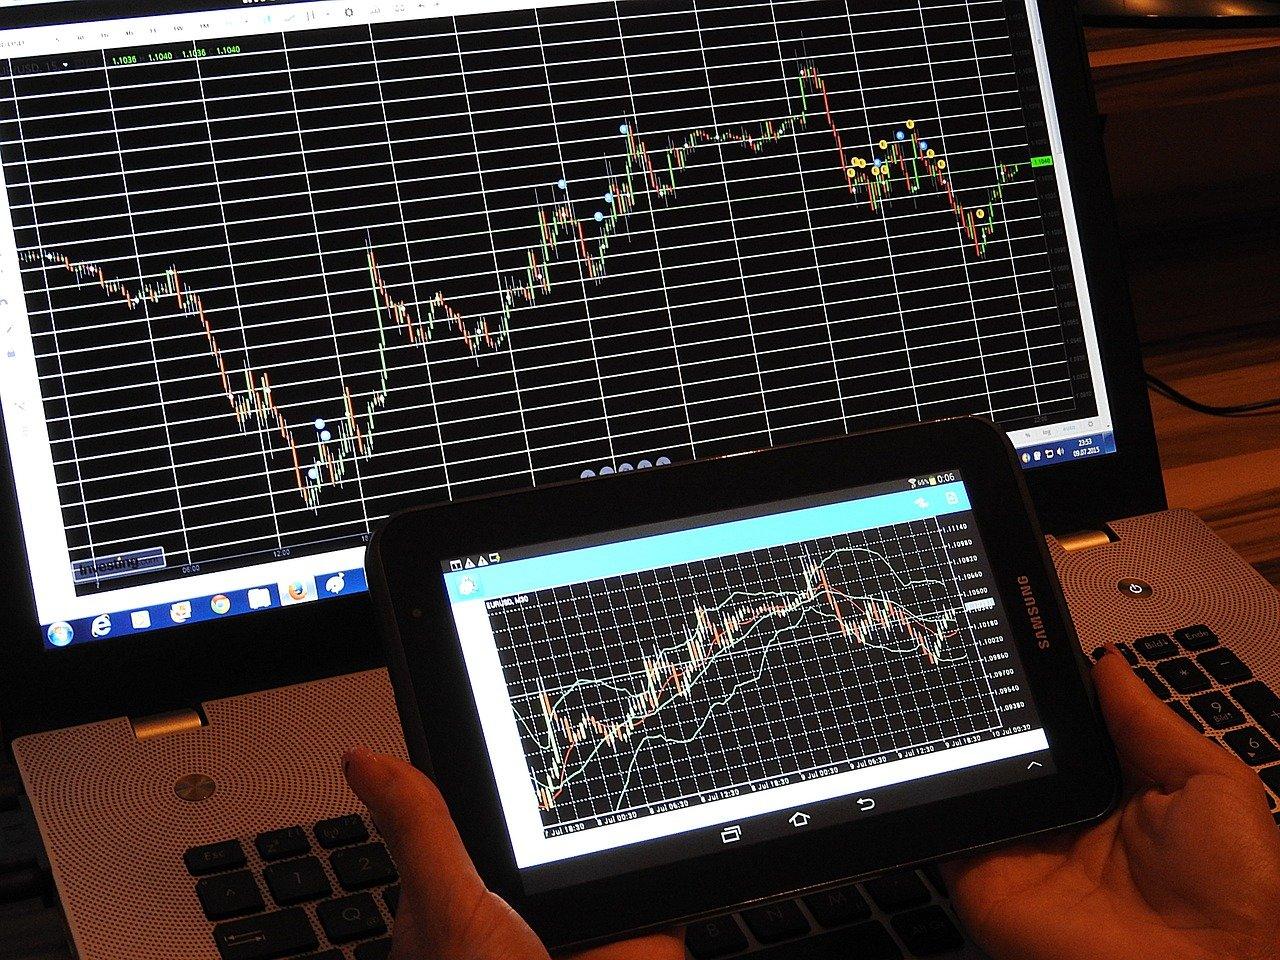 Mejores Cursos de Trading en Línea